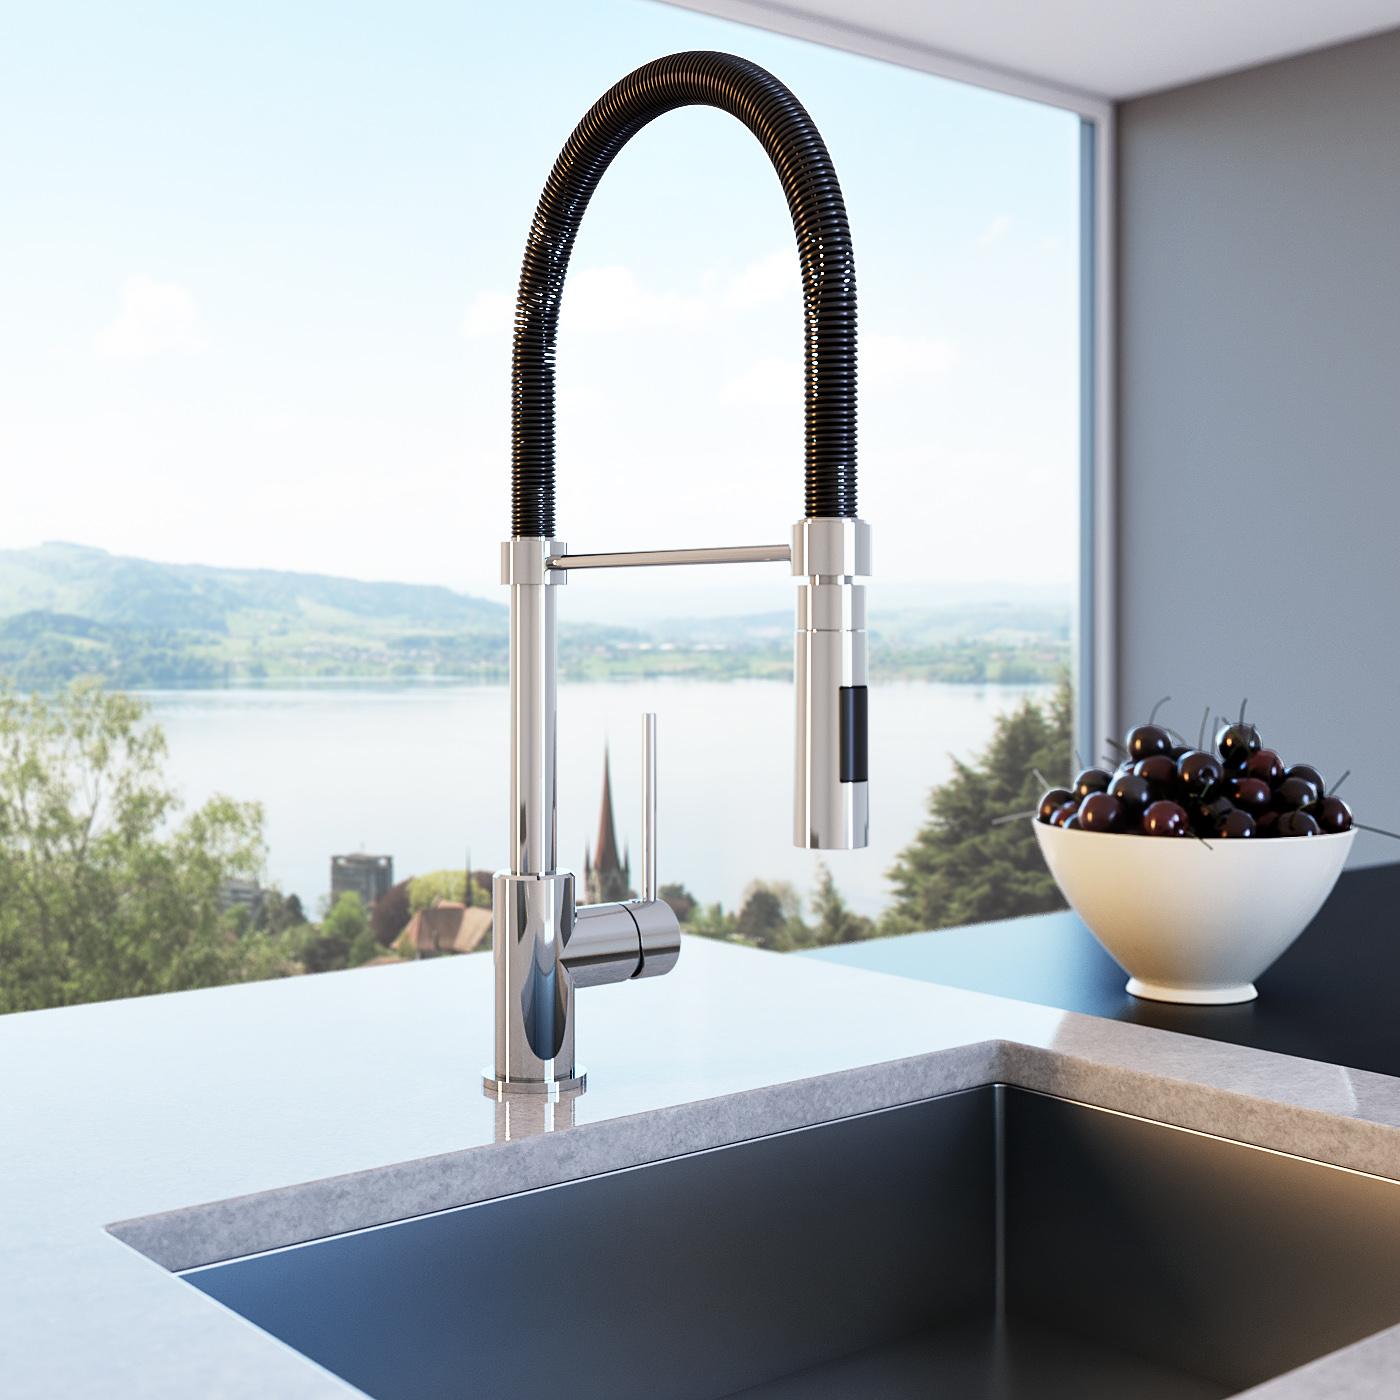 Design Küchenarmaturen